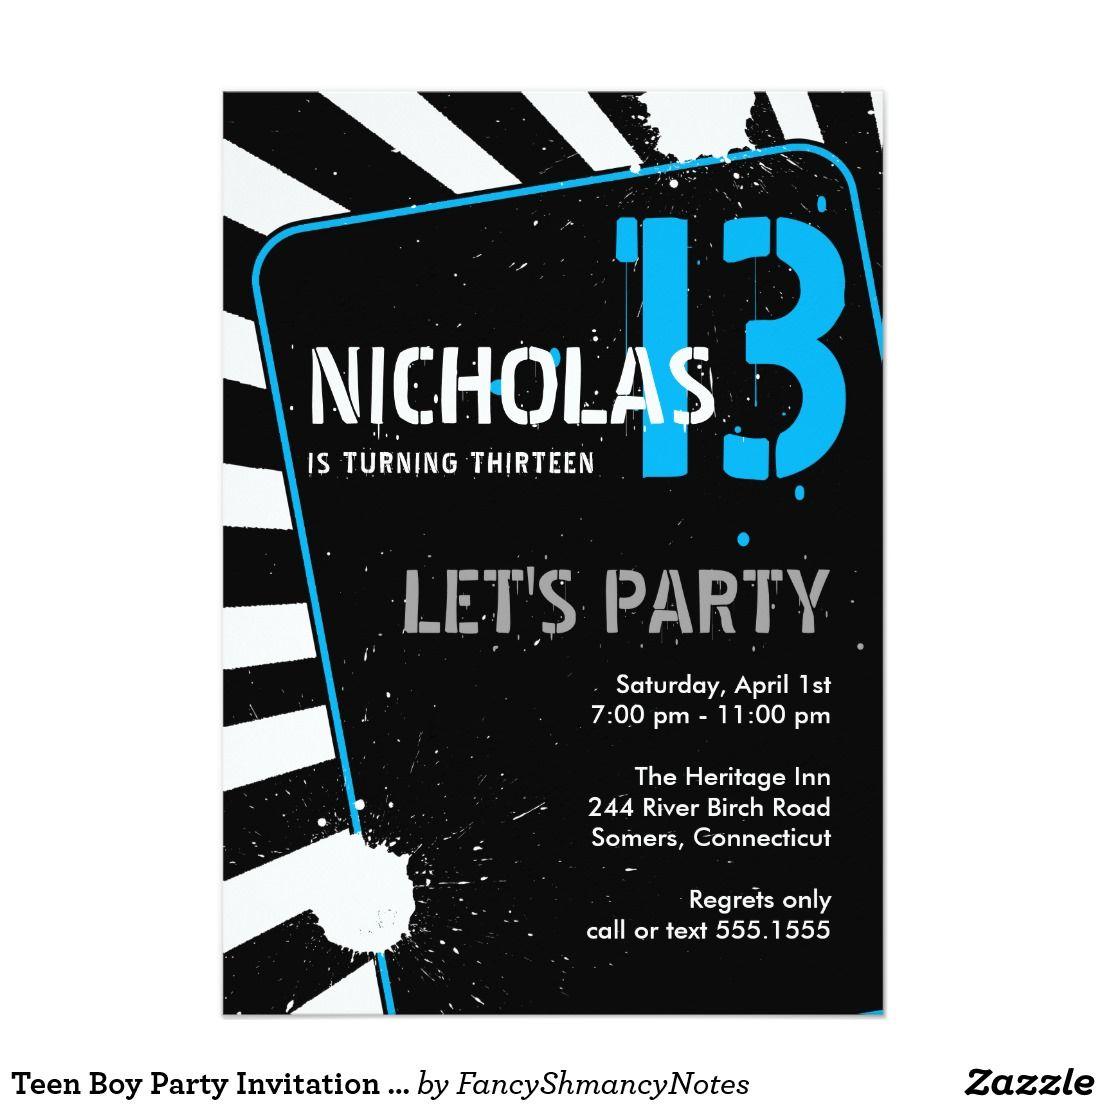 Teen Boy Party Invitation